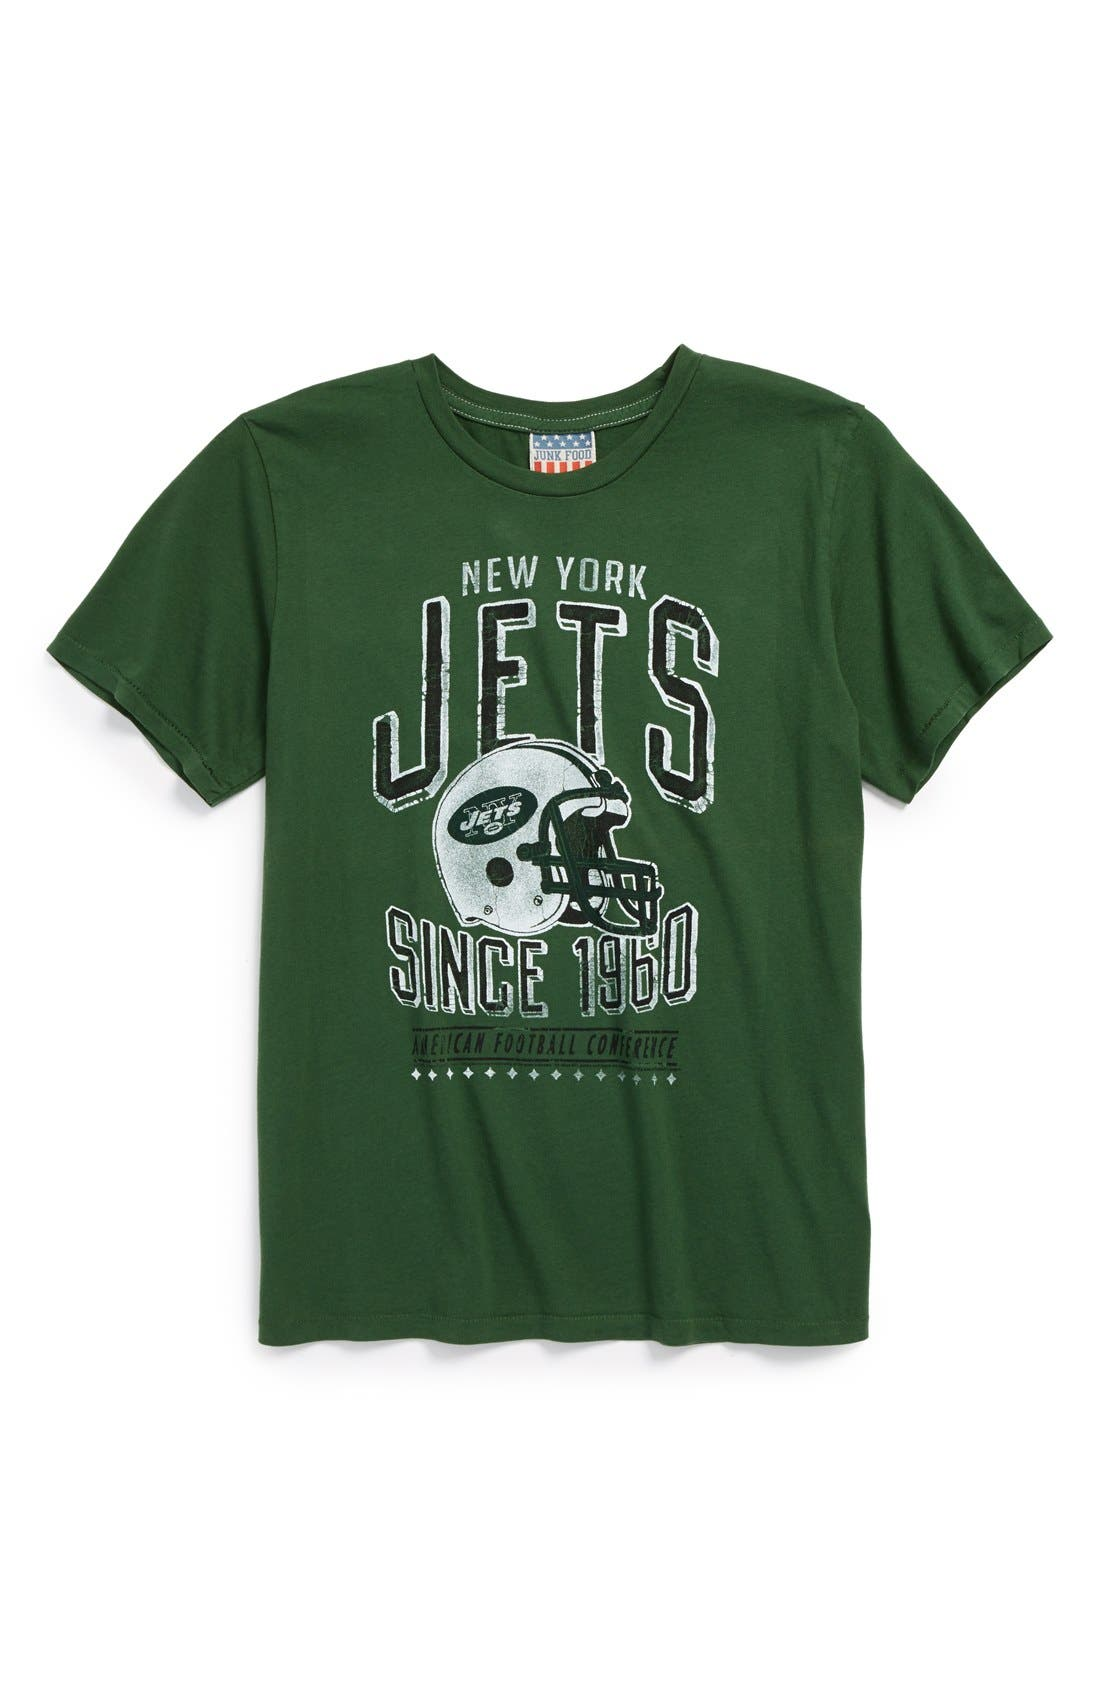 Alternate Image 1 Selected - Junk Food 'New York Jets - NFL' Graphic T-Shirt (Little Boys & Big Boys)